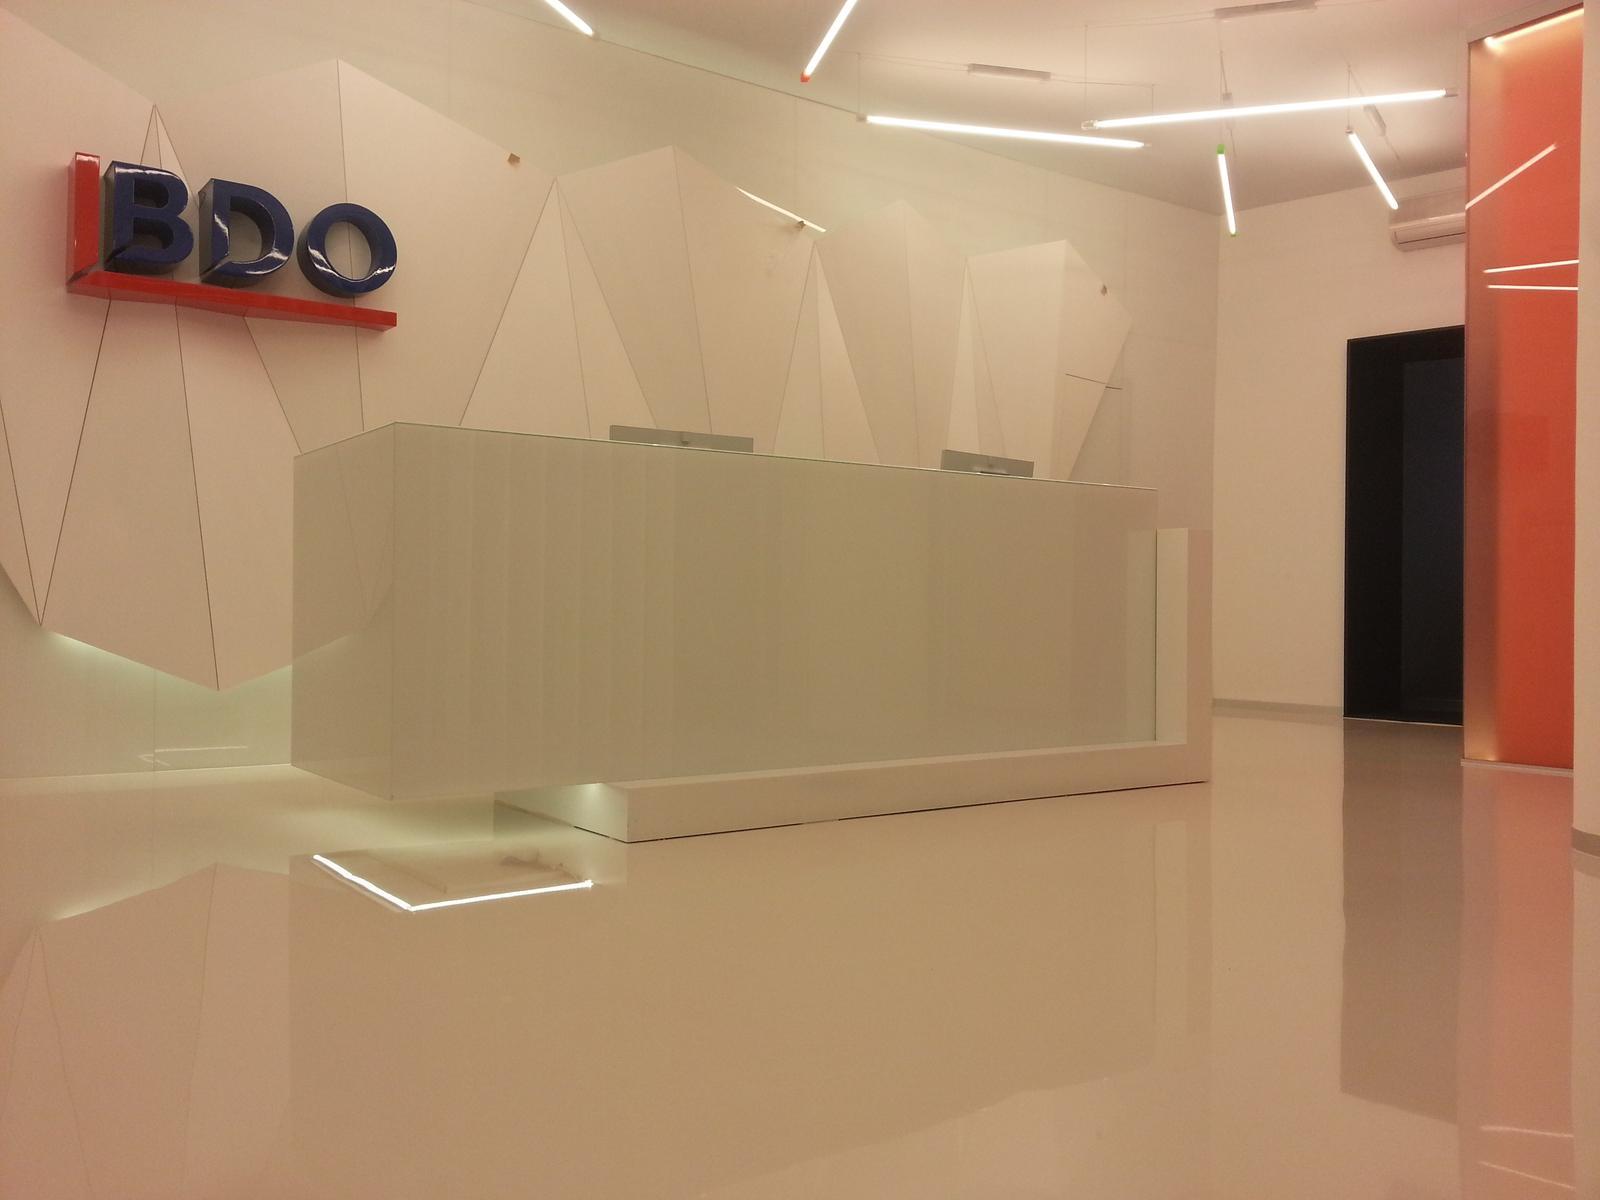 eurotipek - Tento priestor navrhoval vynikajúci architekt Roman Palko